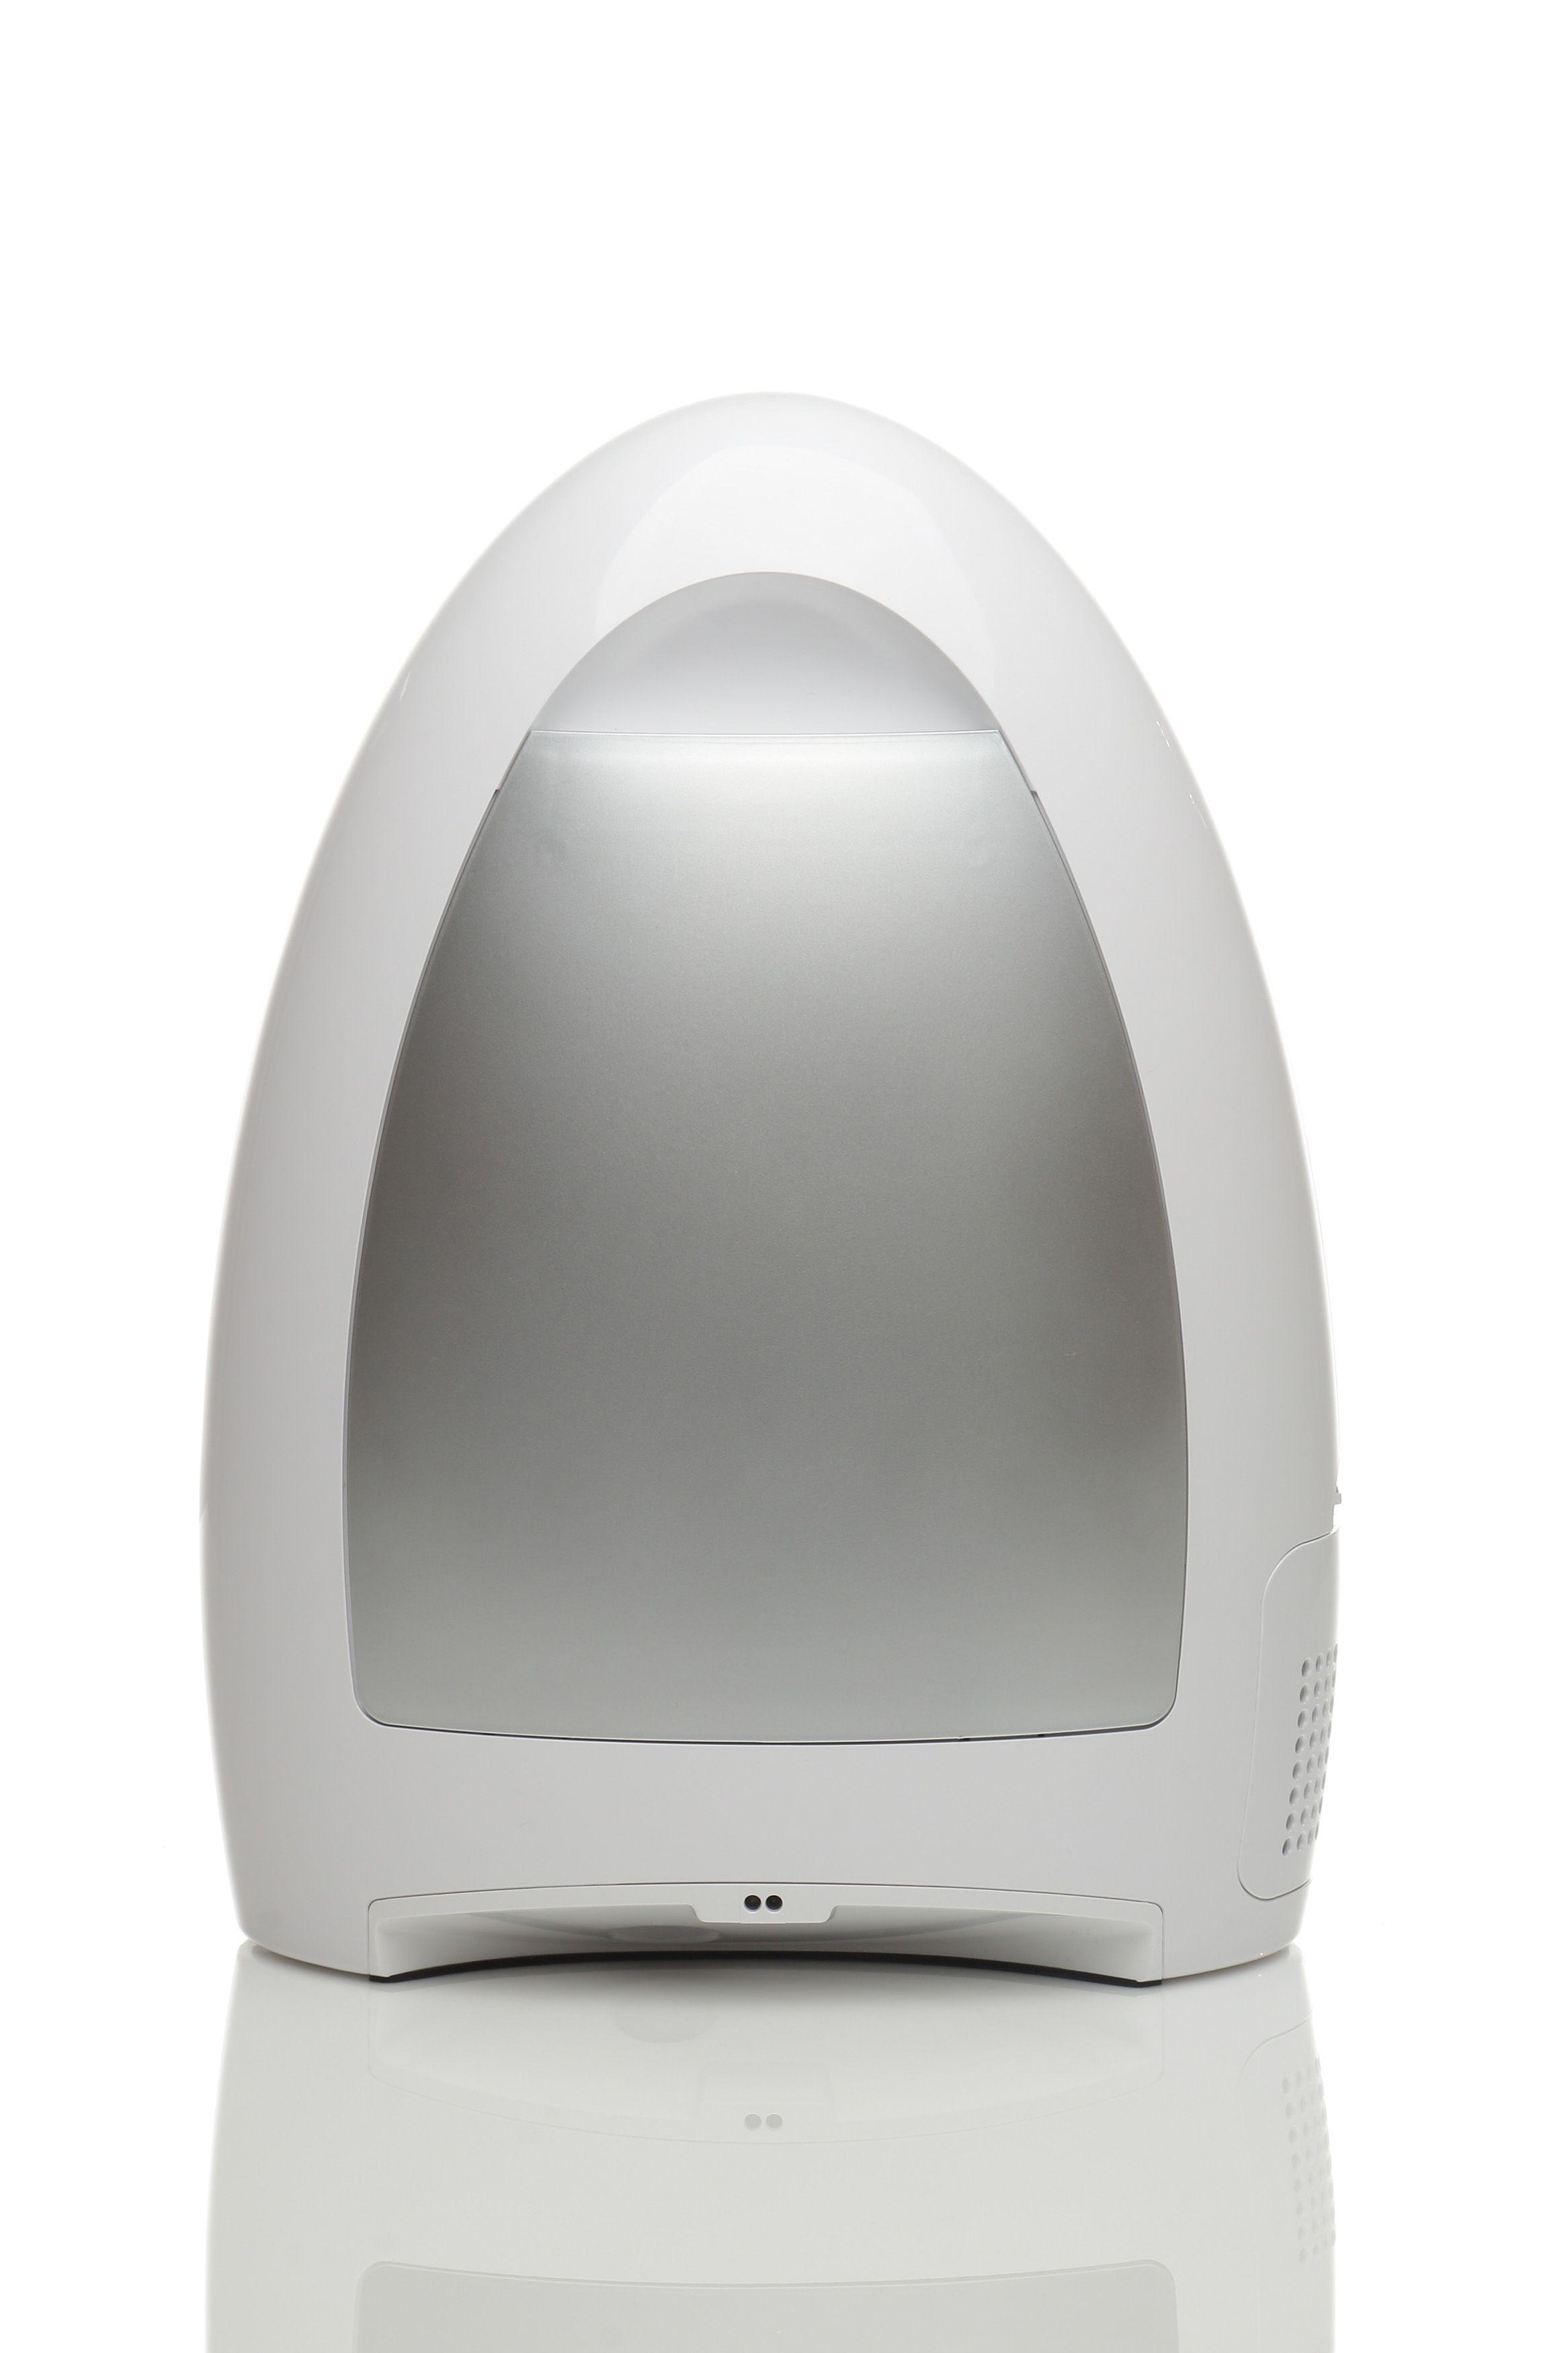 EyeVac Home Touchless Vacuum, White - Walmart.com | Christmas 2018 ...